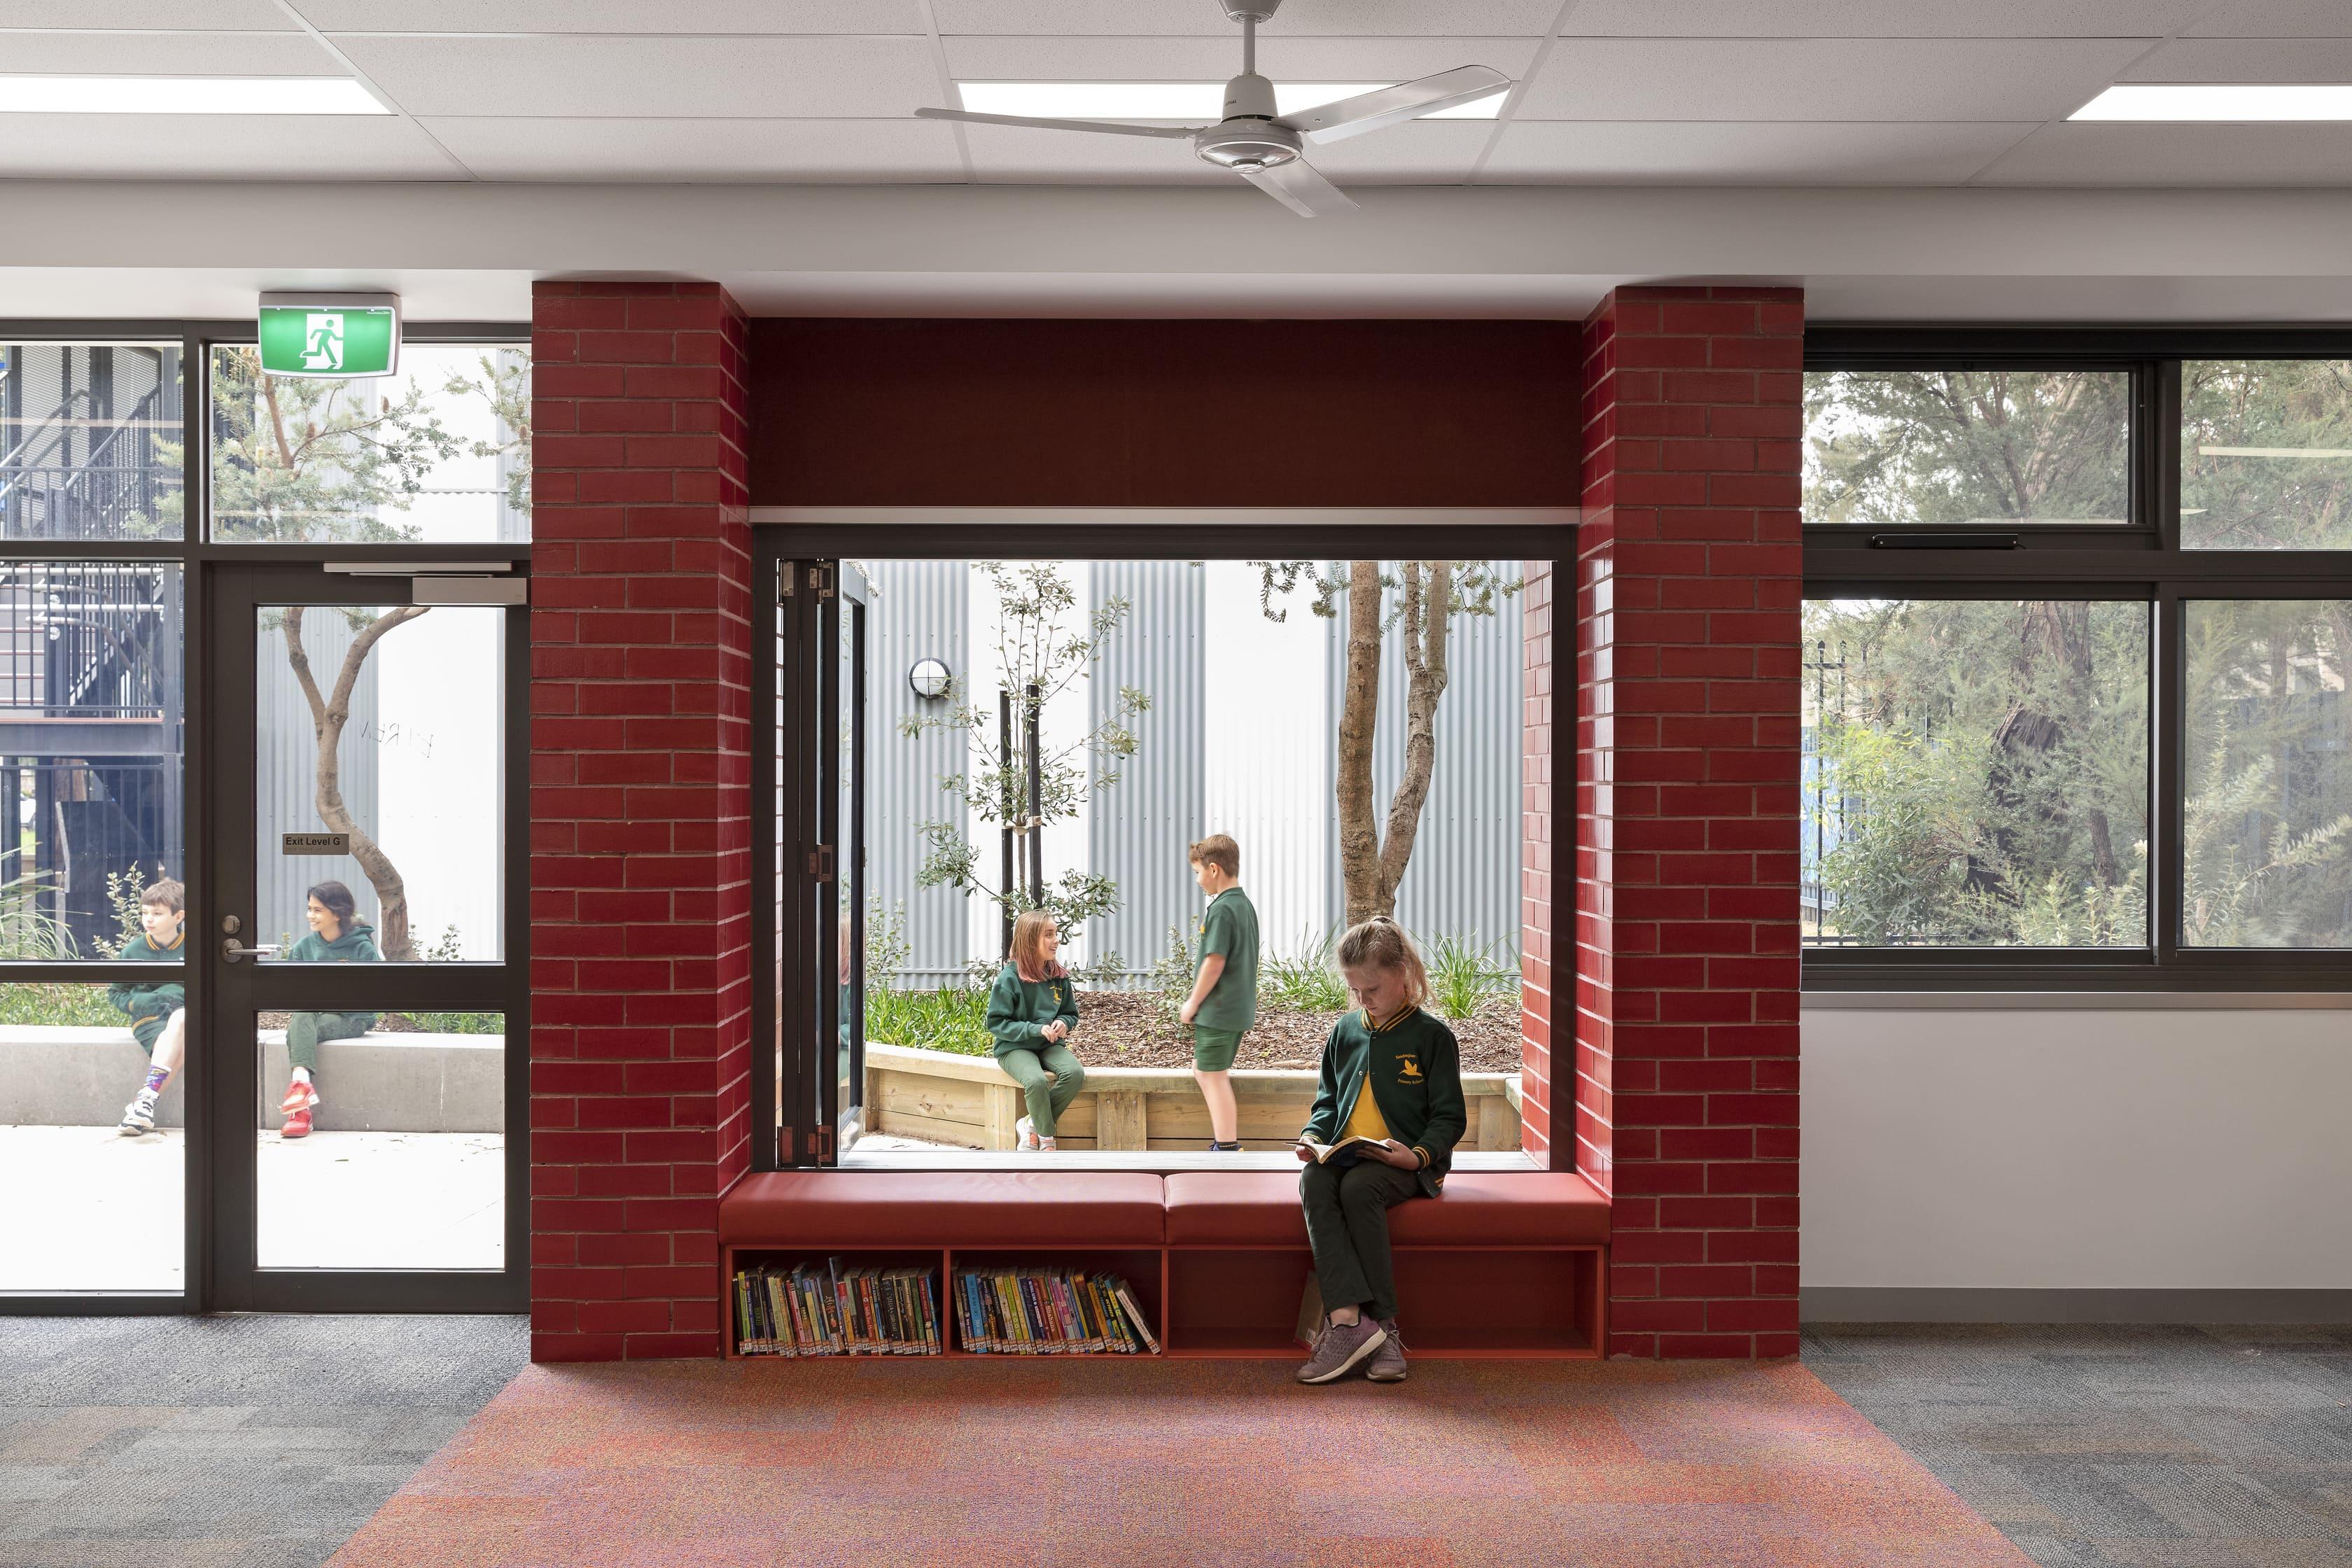 2Construct - Sandringham Primary School 06